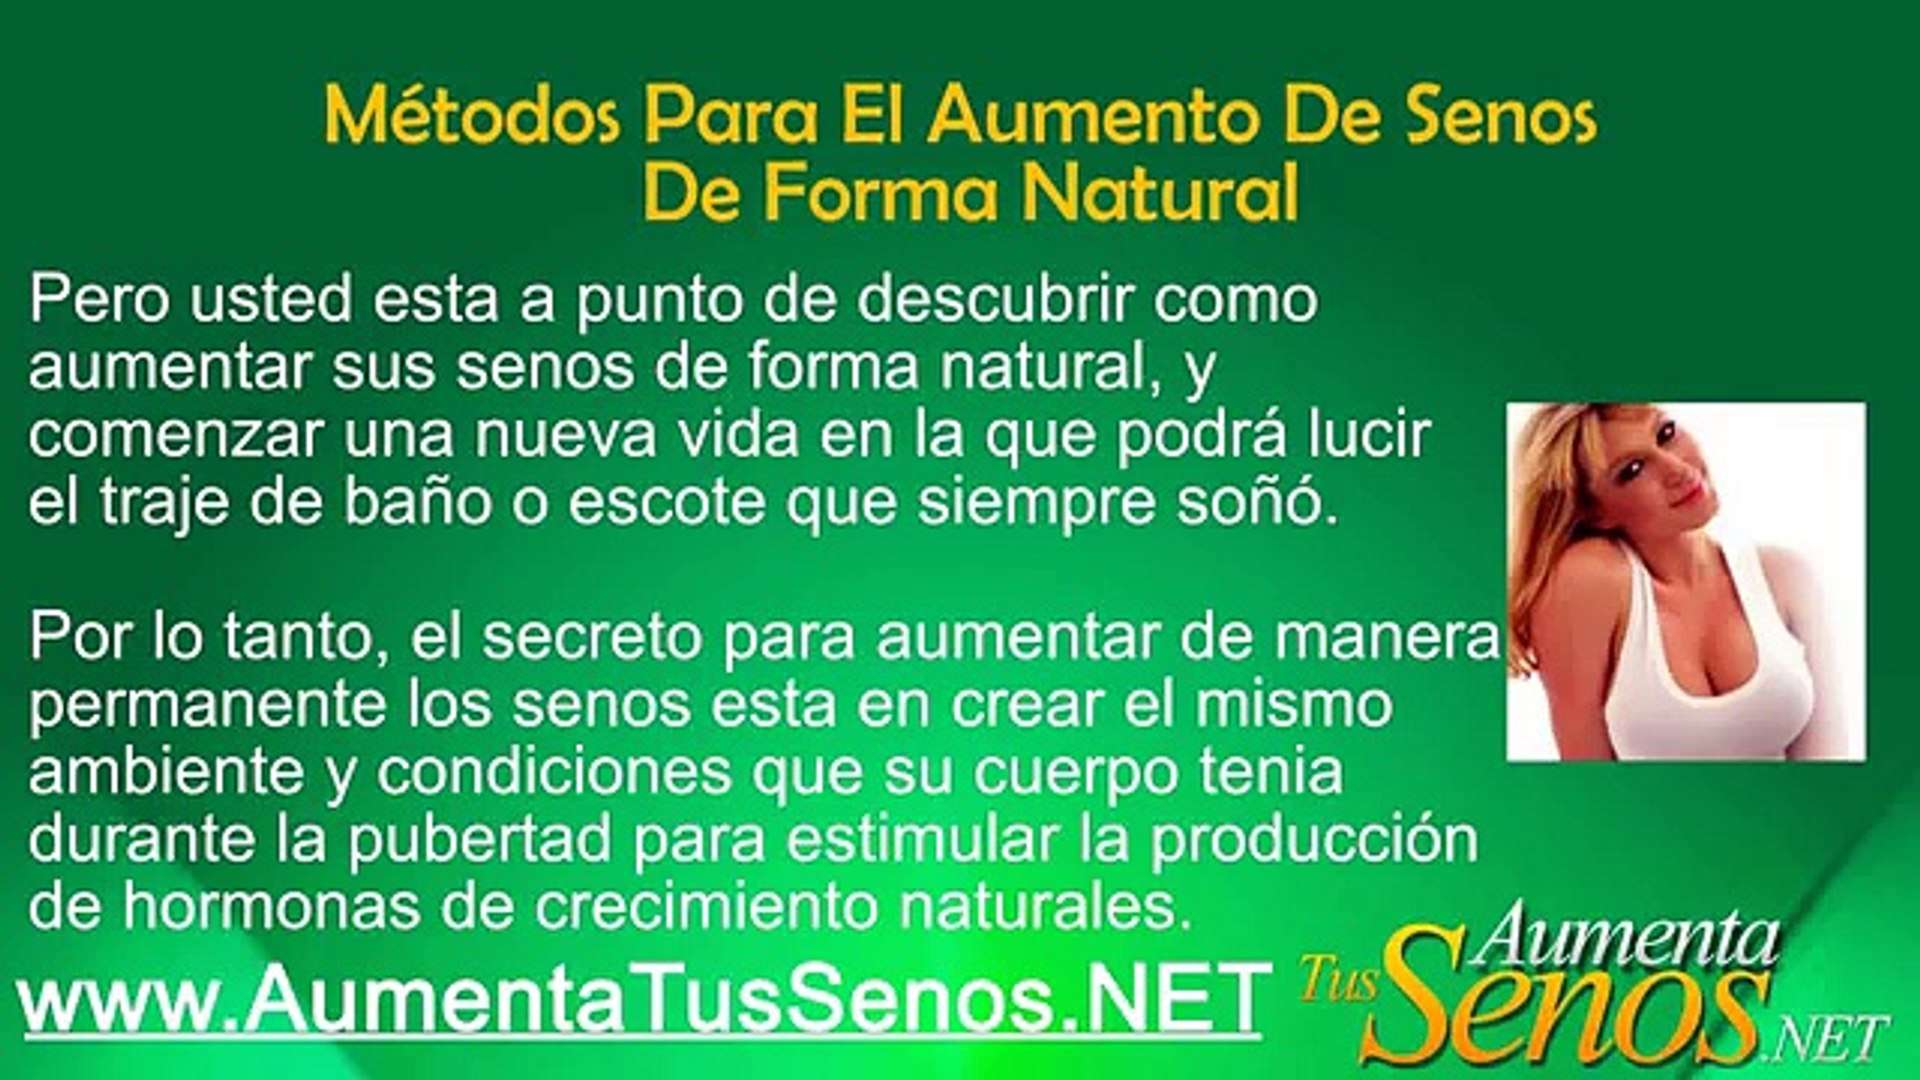 Aumenta Tus Senos De Manera Natural Aumentar El Busto De Manera Natural Vídeo Dailymotion